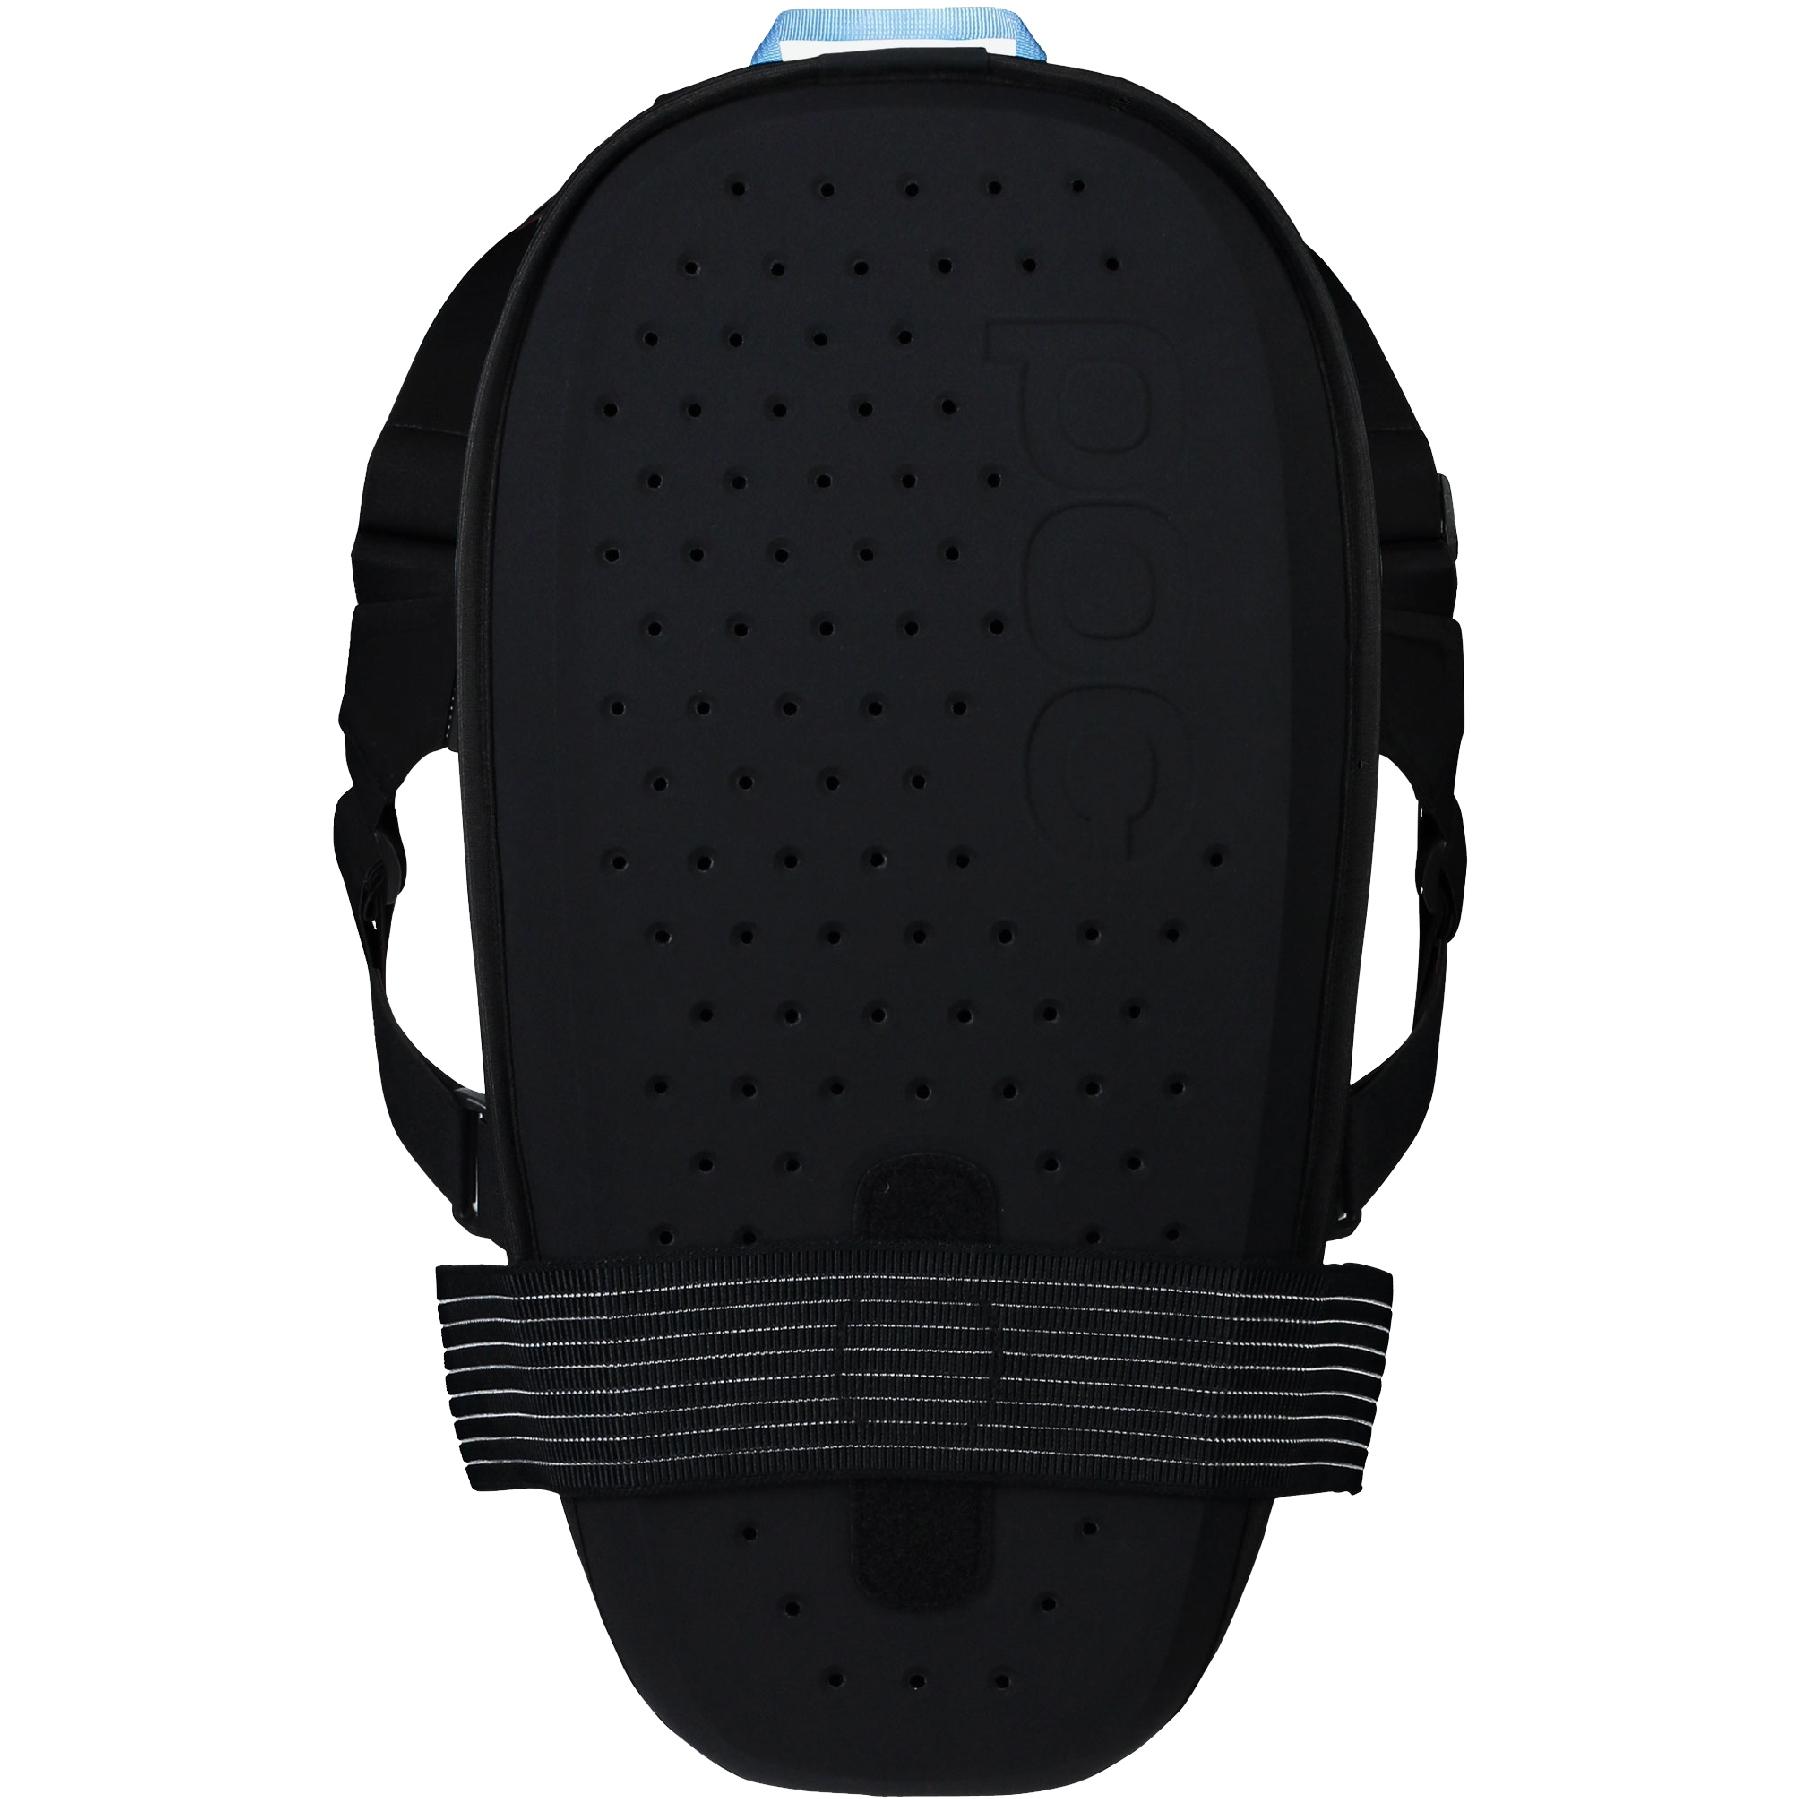 Produktbild von POC VPD Air Back Rückenprotektor - 1002 Uranium Black